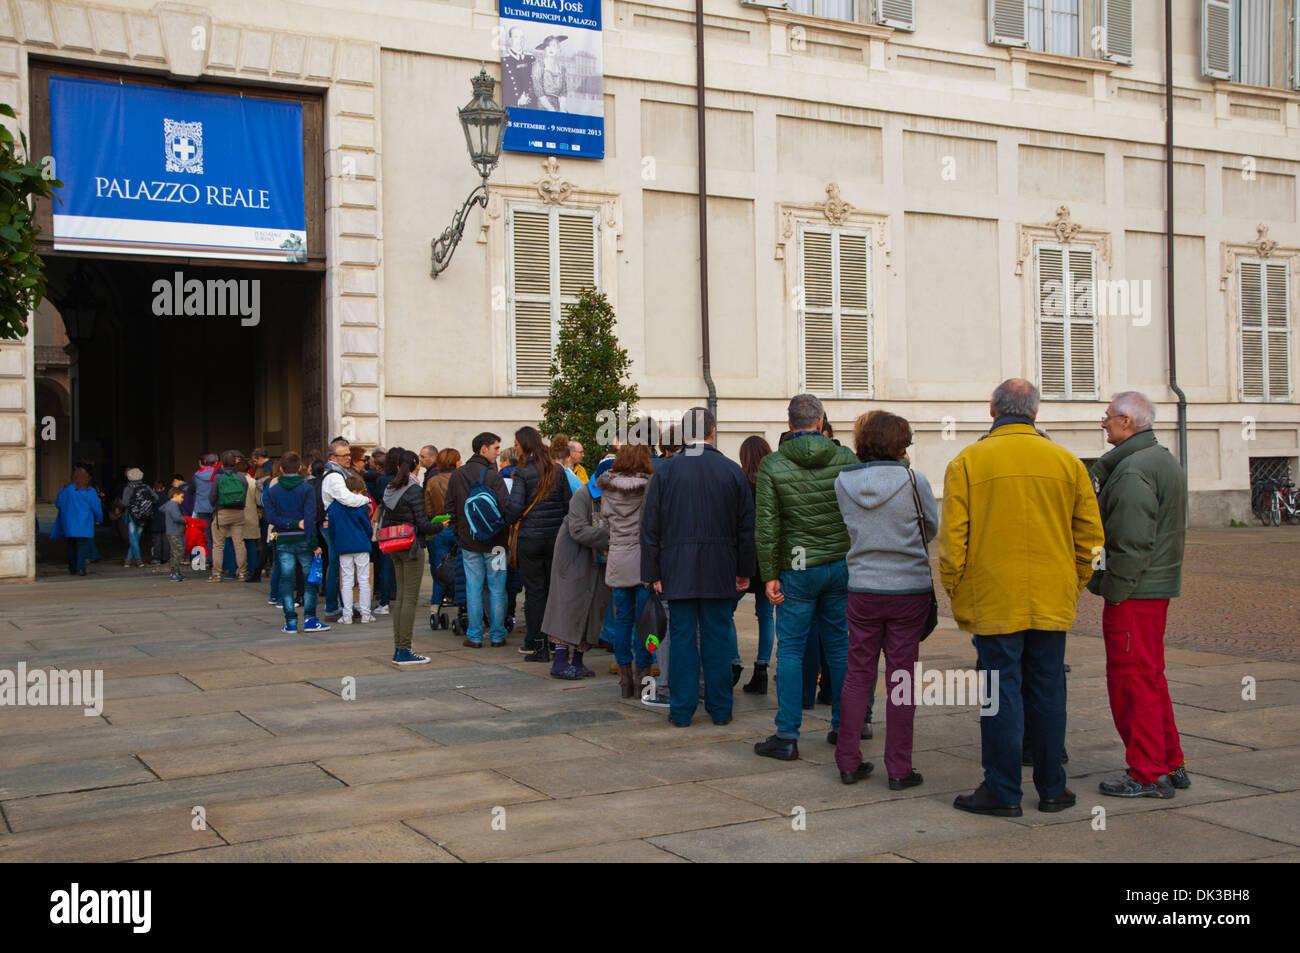 File d'attente à Palazzo Reale à la place Piazza Castello Turin Piémont Italie Europe Photo Stock